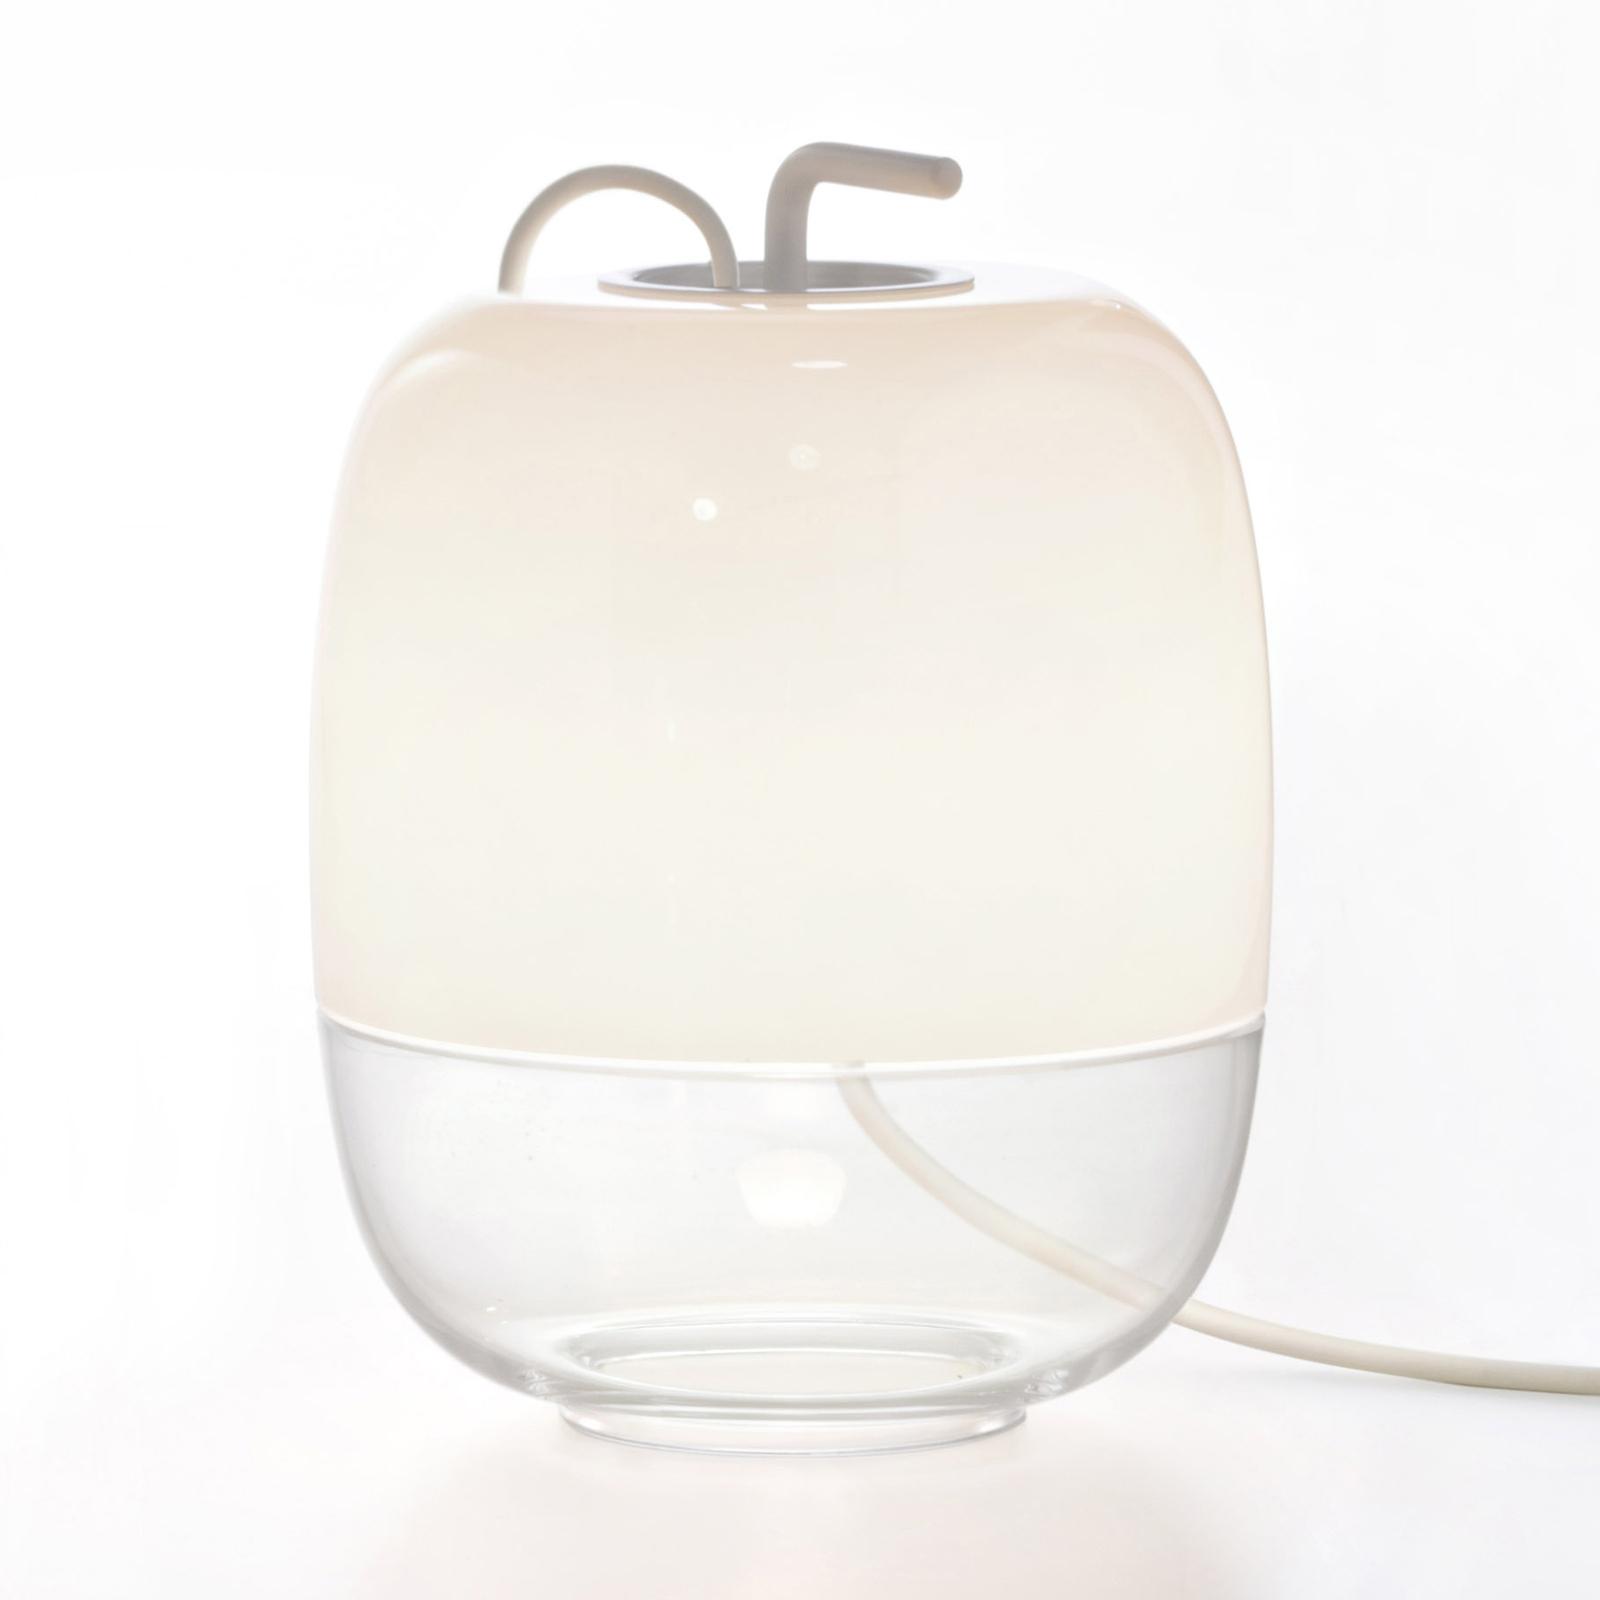 Prandina Gong T1 lampada da tavolo, bianco